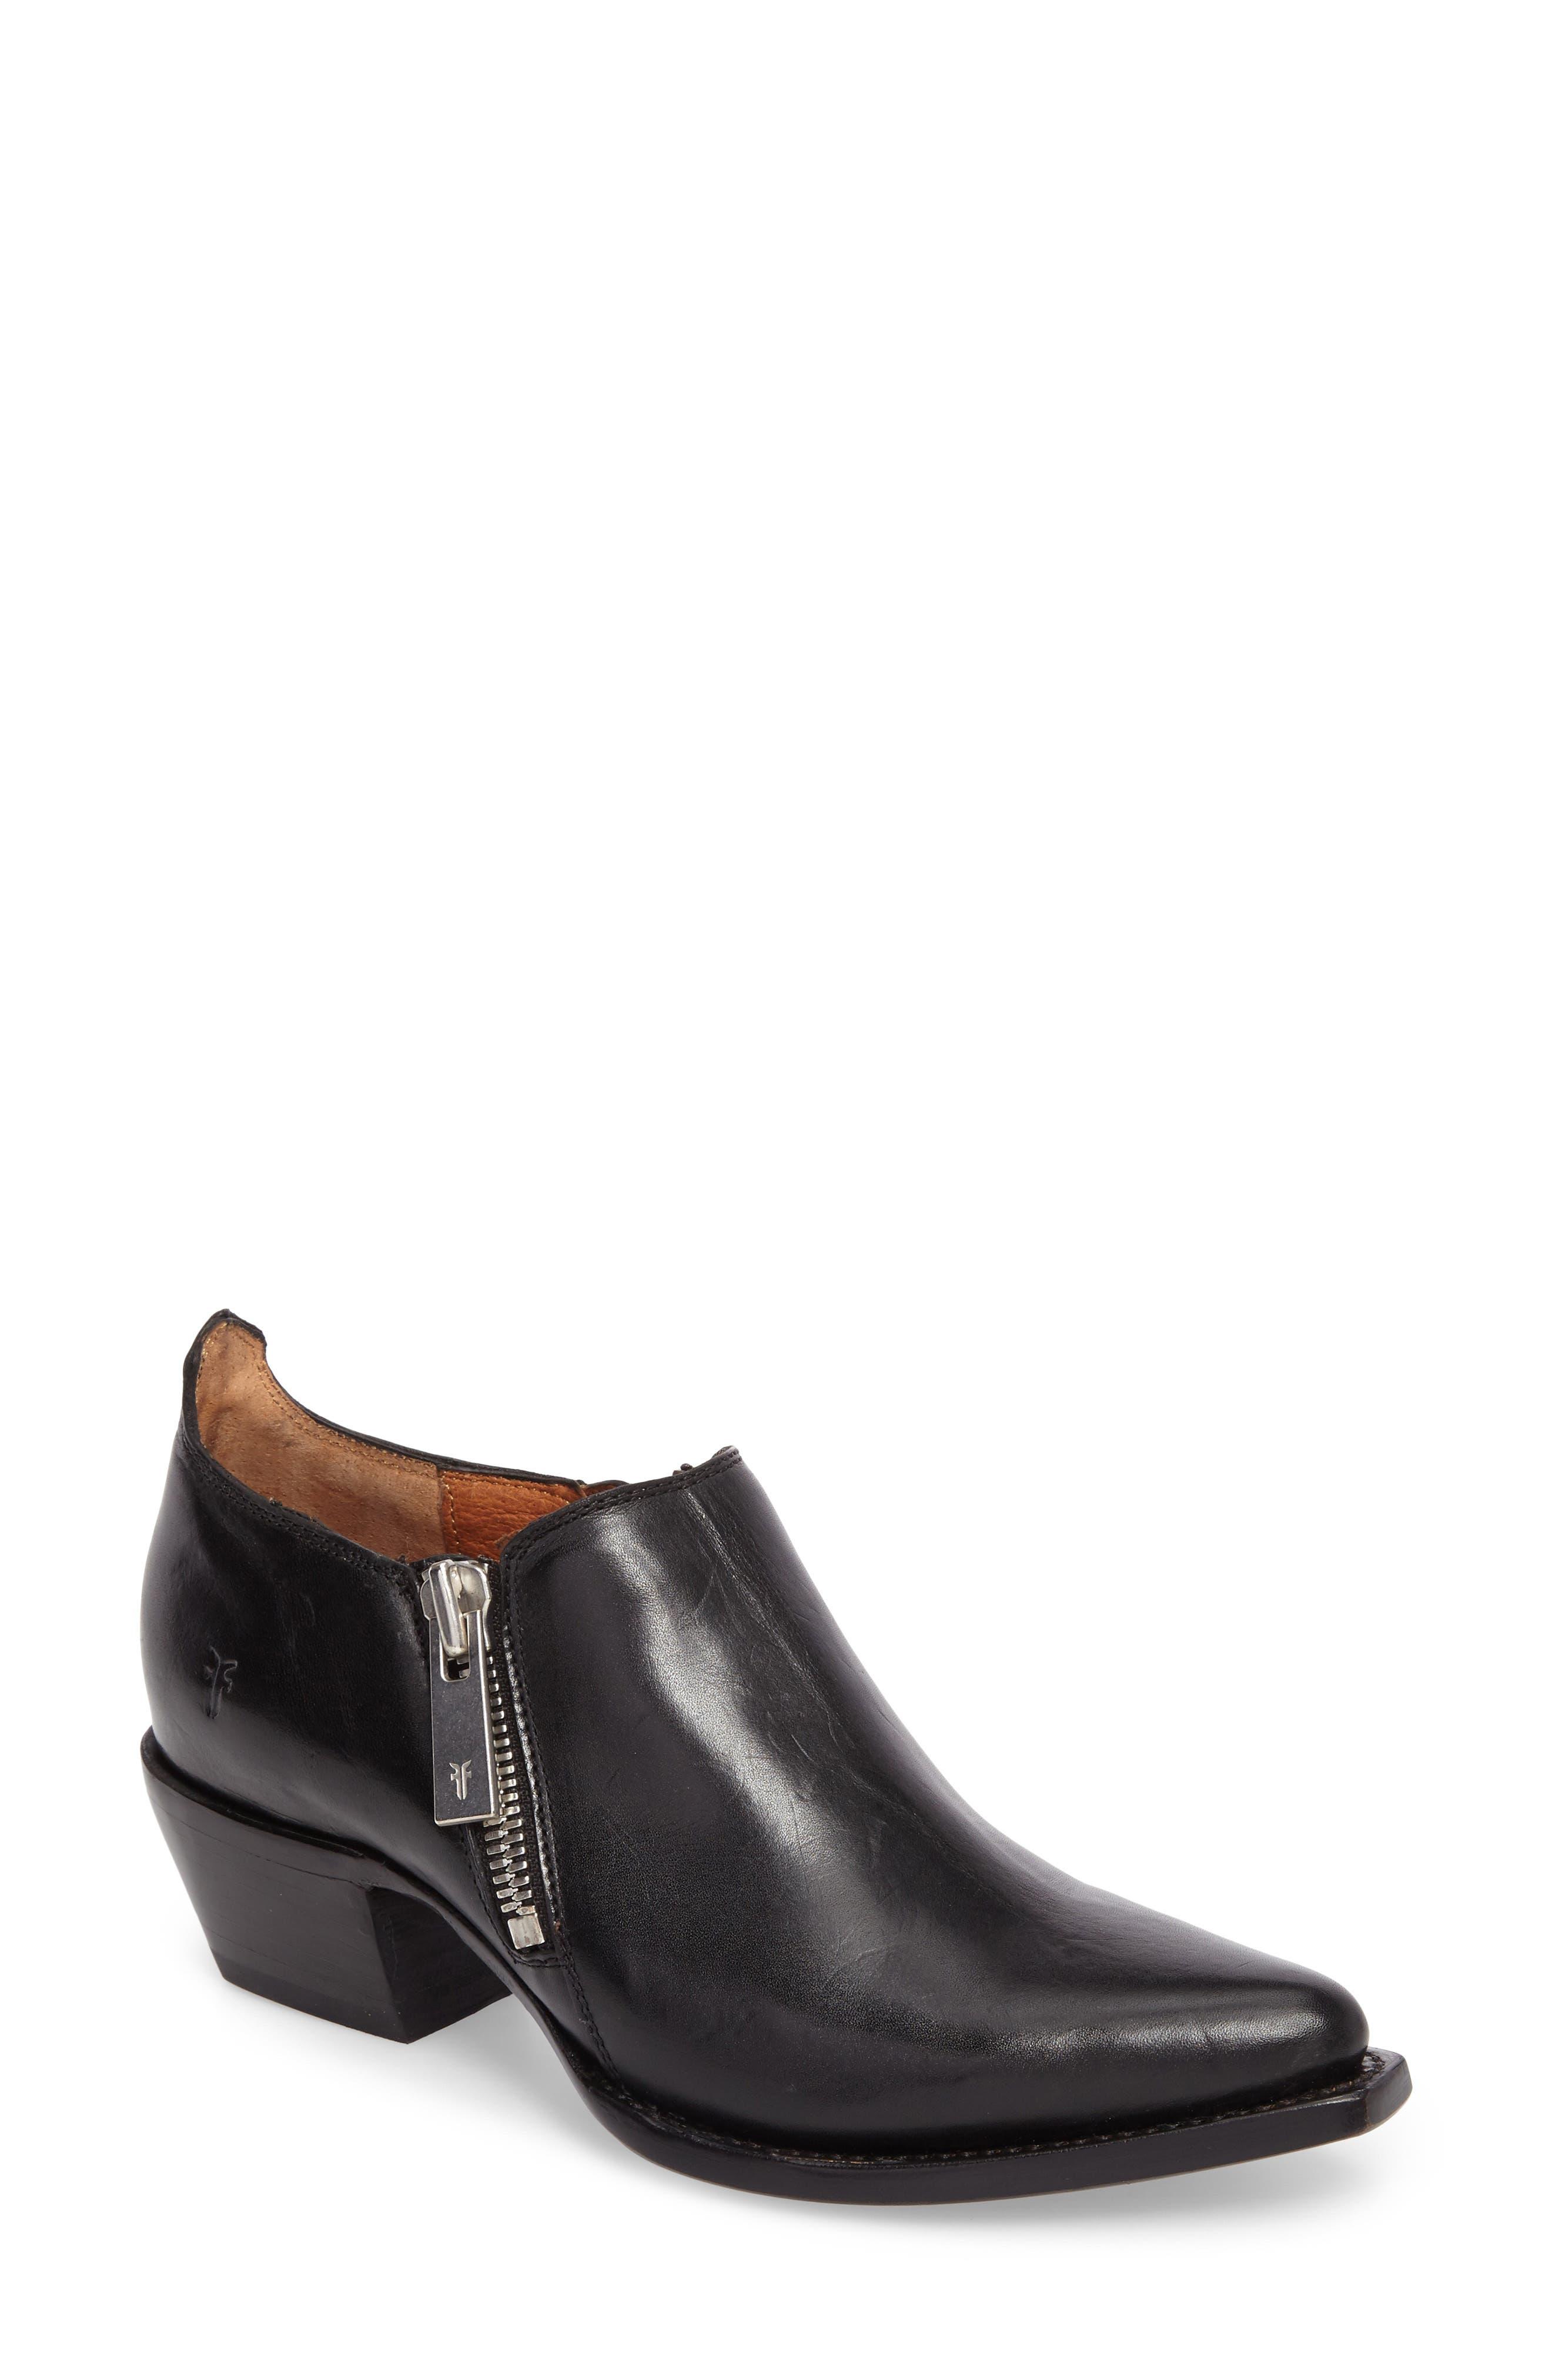 Sacha Double Zip Bootie,                         Main,                         color, Black